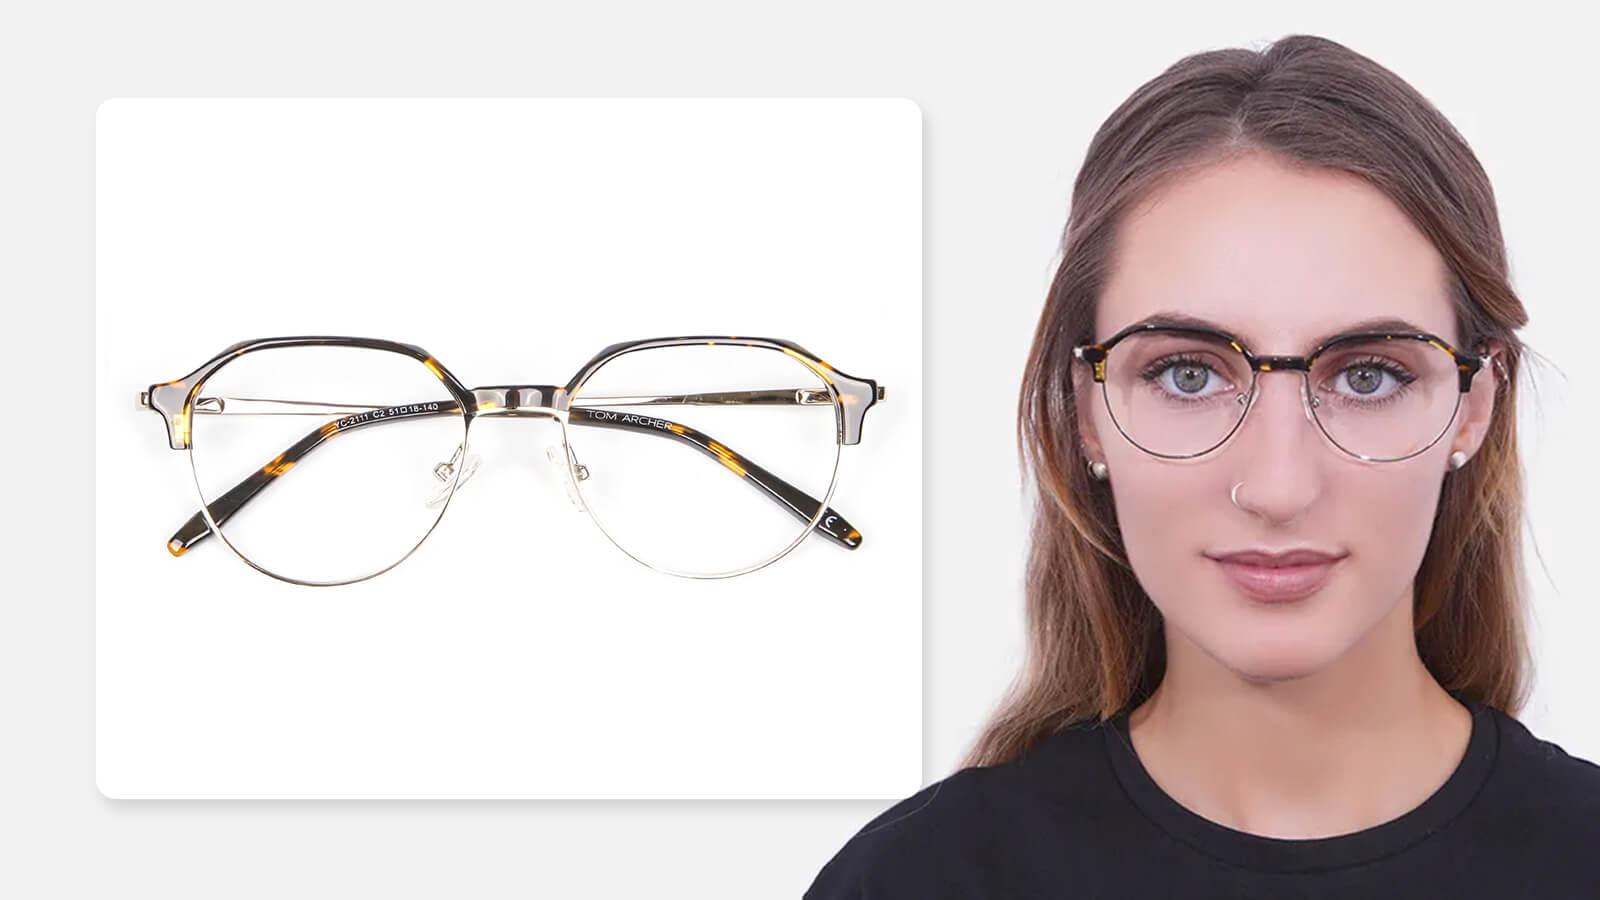 Brow-defining browline frames